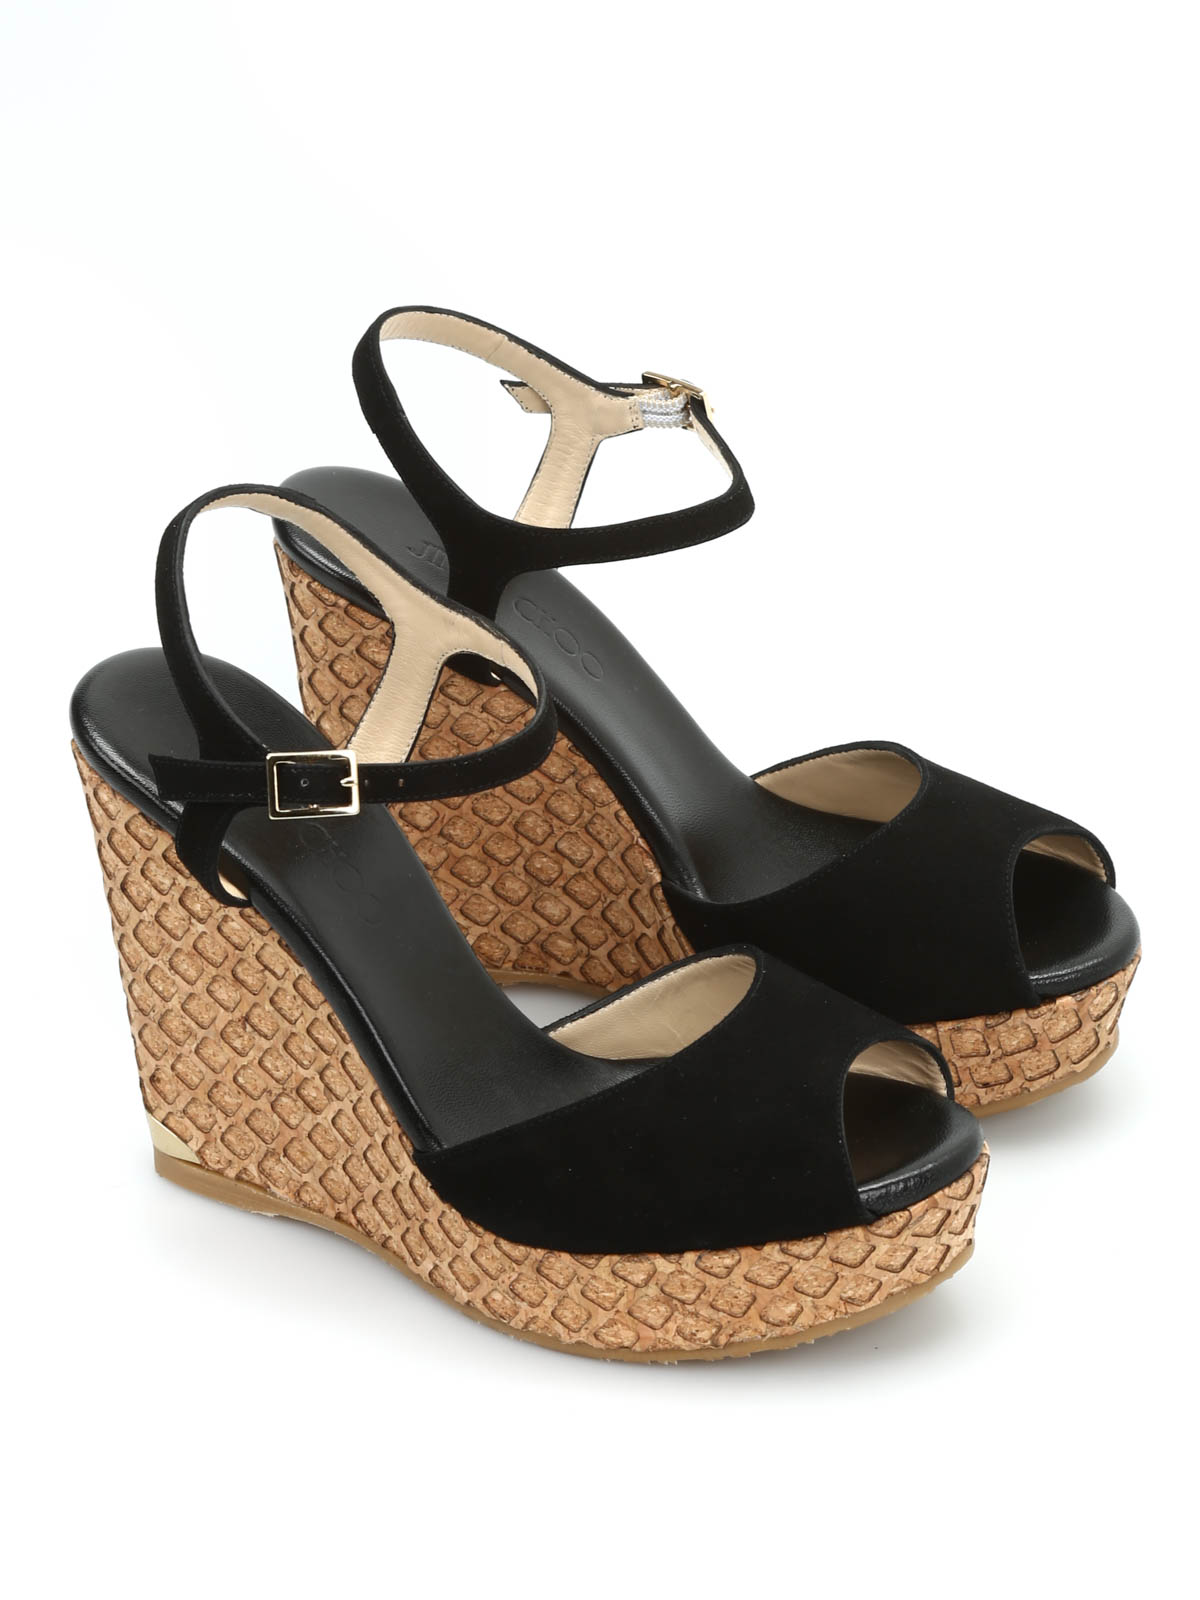 76caa9d0c183 Jimmy Choo - Perla suede and cork wedges - sandals - PERLA 120 DKW BLACK